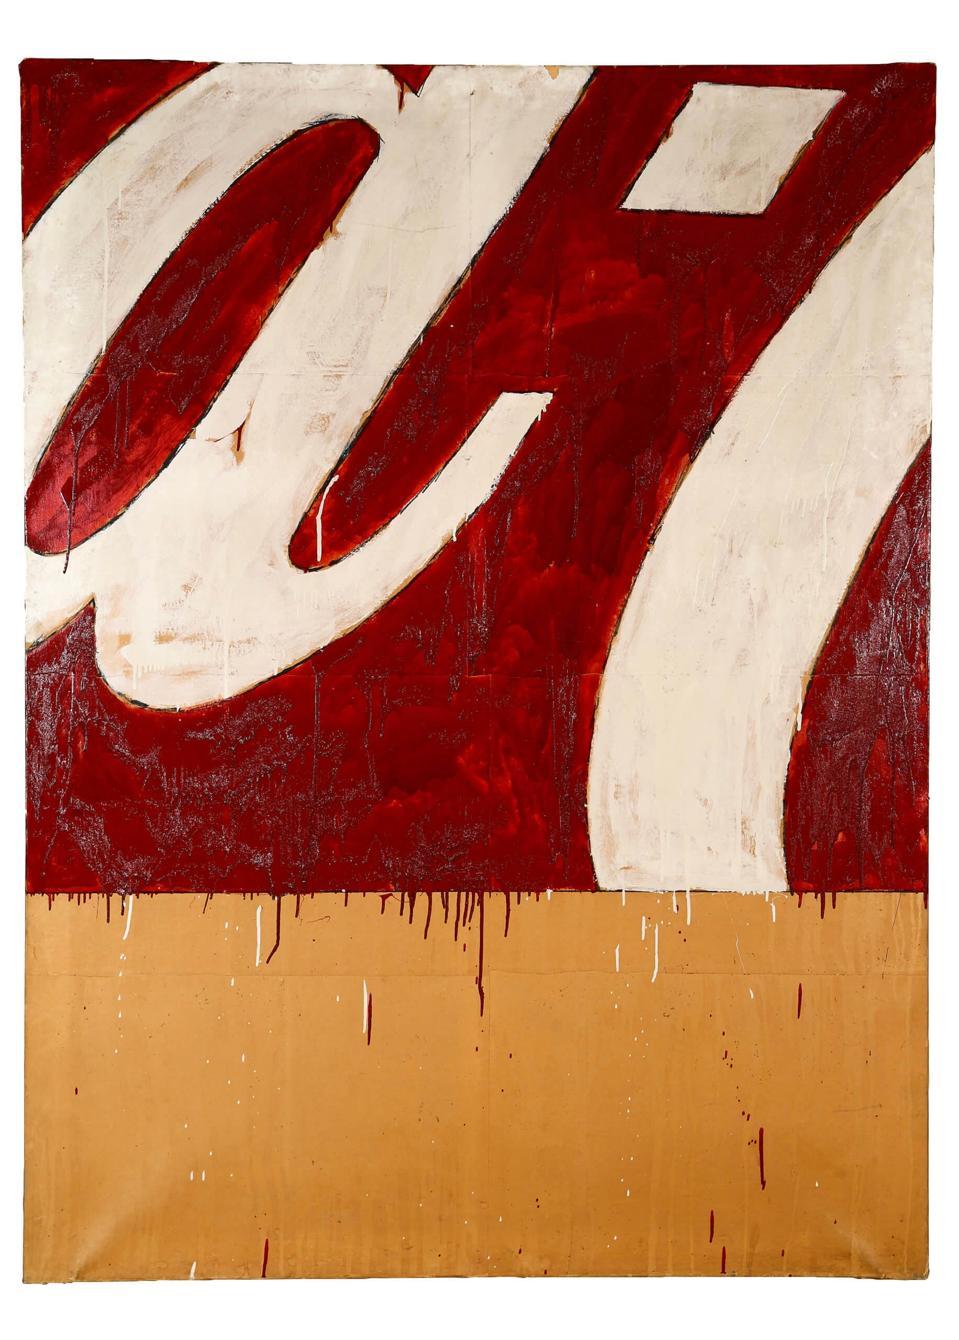 Mario Schifano, Coca-Cola pop art painting